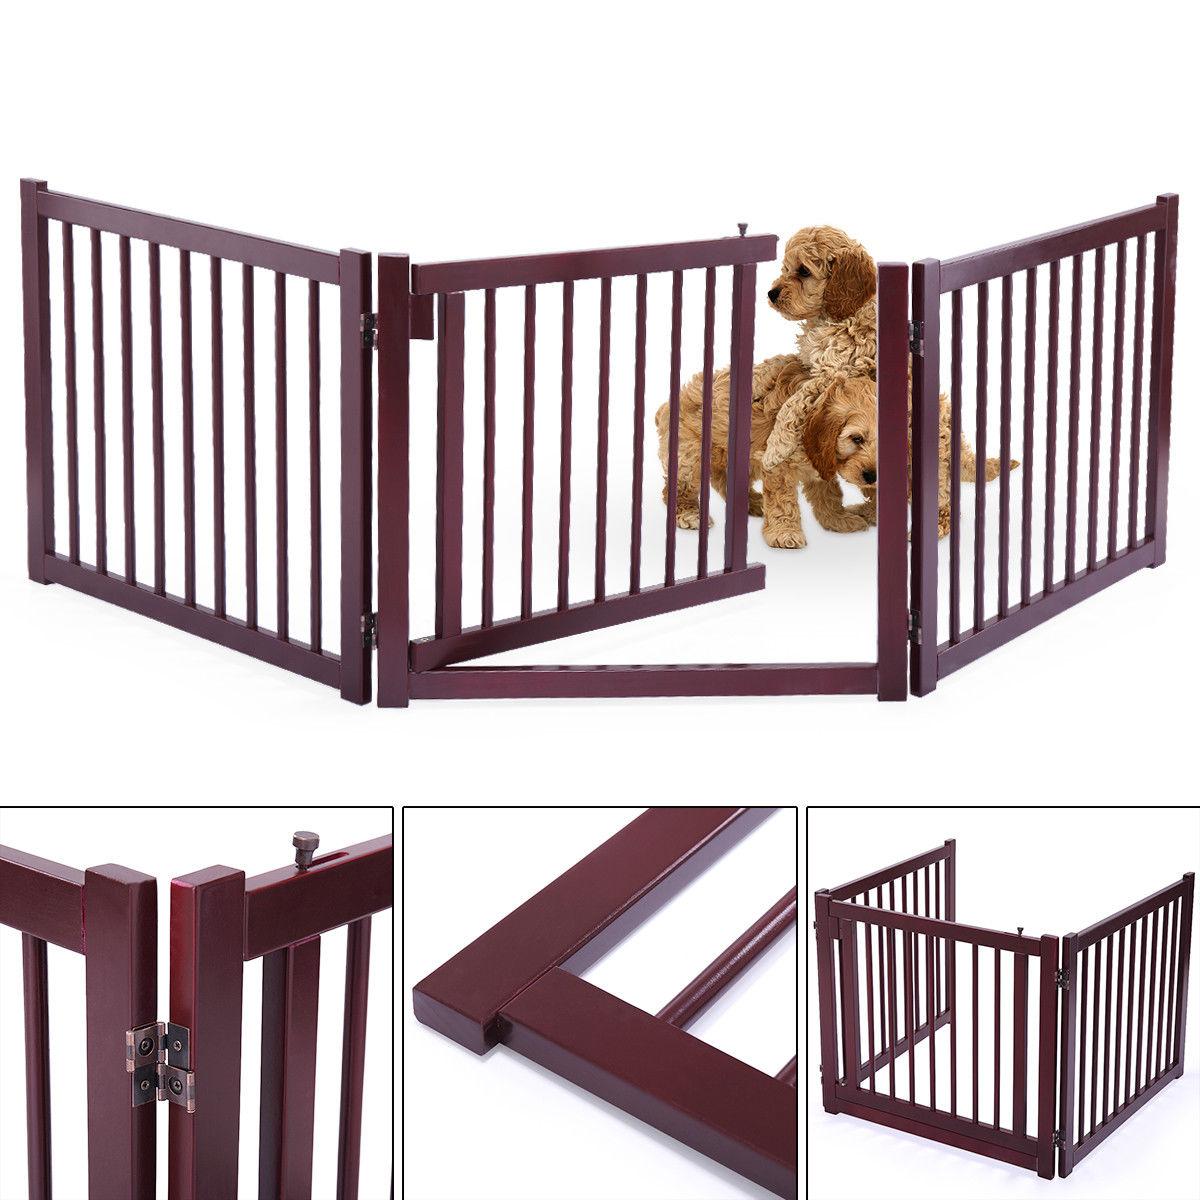 Wood Dog Pet Gate Indoor Barrier Free Standing Folding